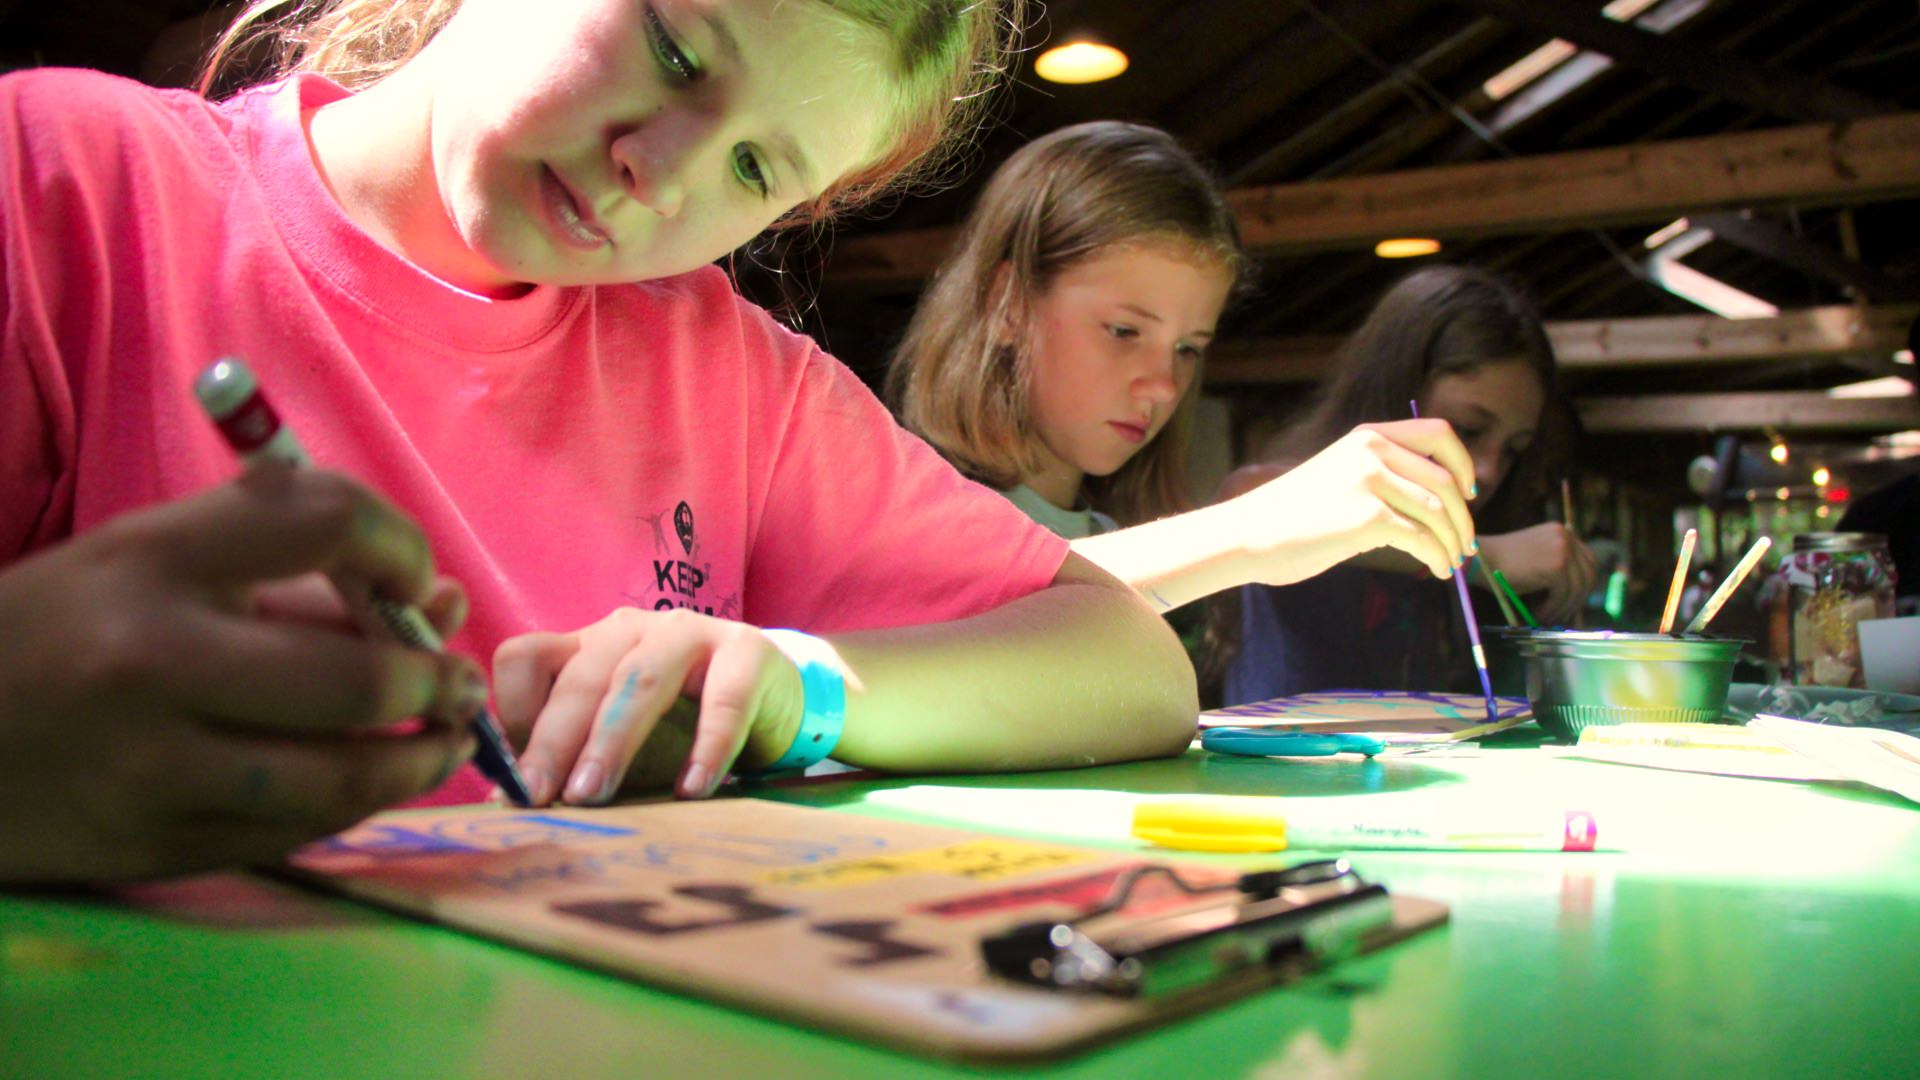 kids painting at summer camp